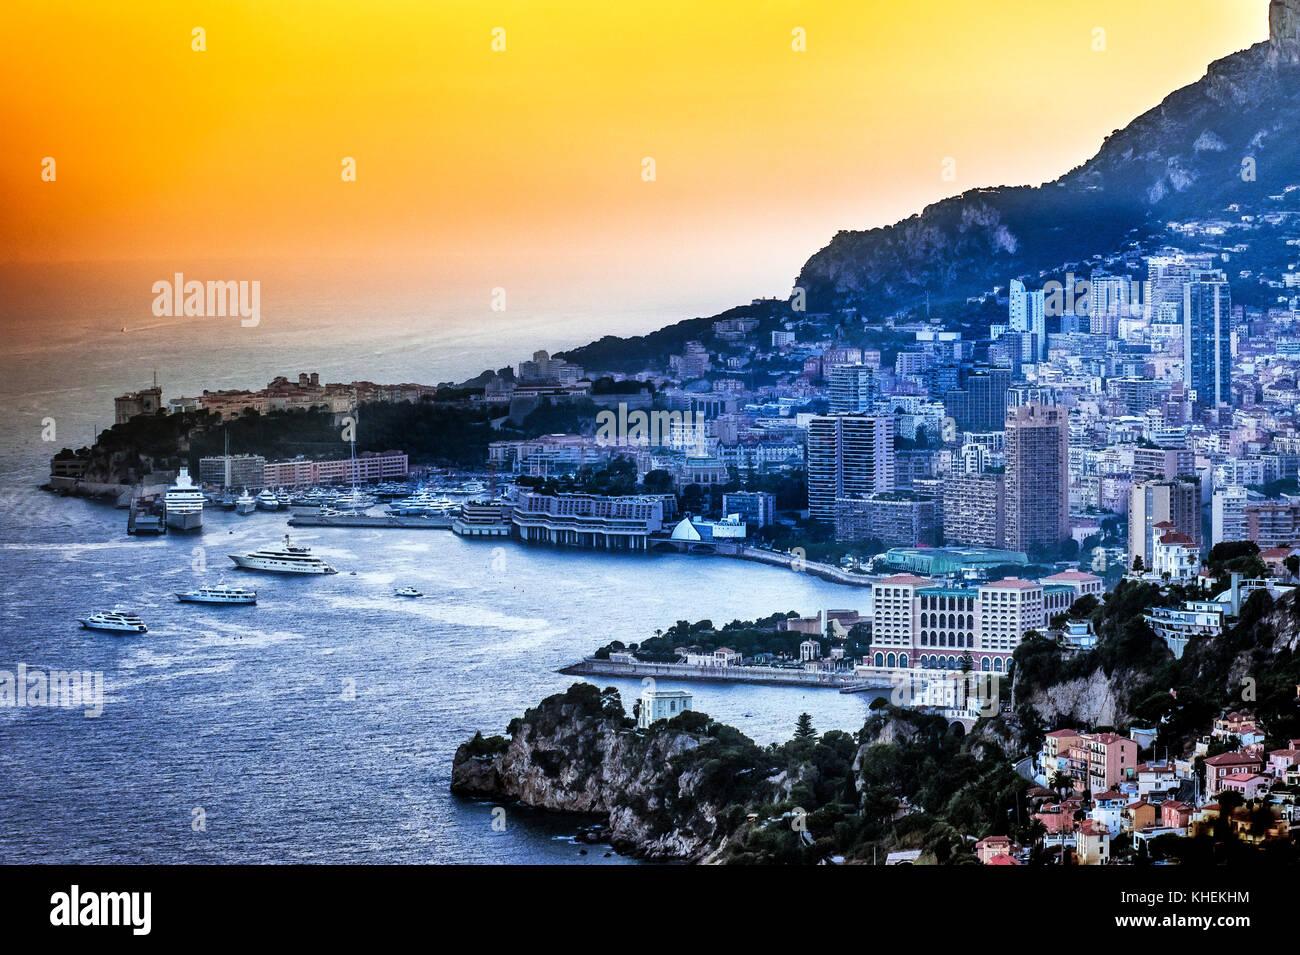 France, Principality of Monaco (98). Monte Carlo. Bay of Monaco at sunset - Stock Image